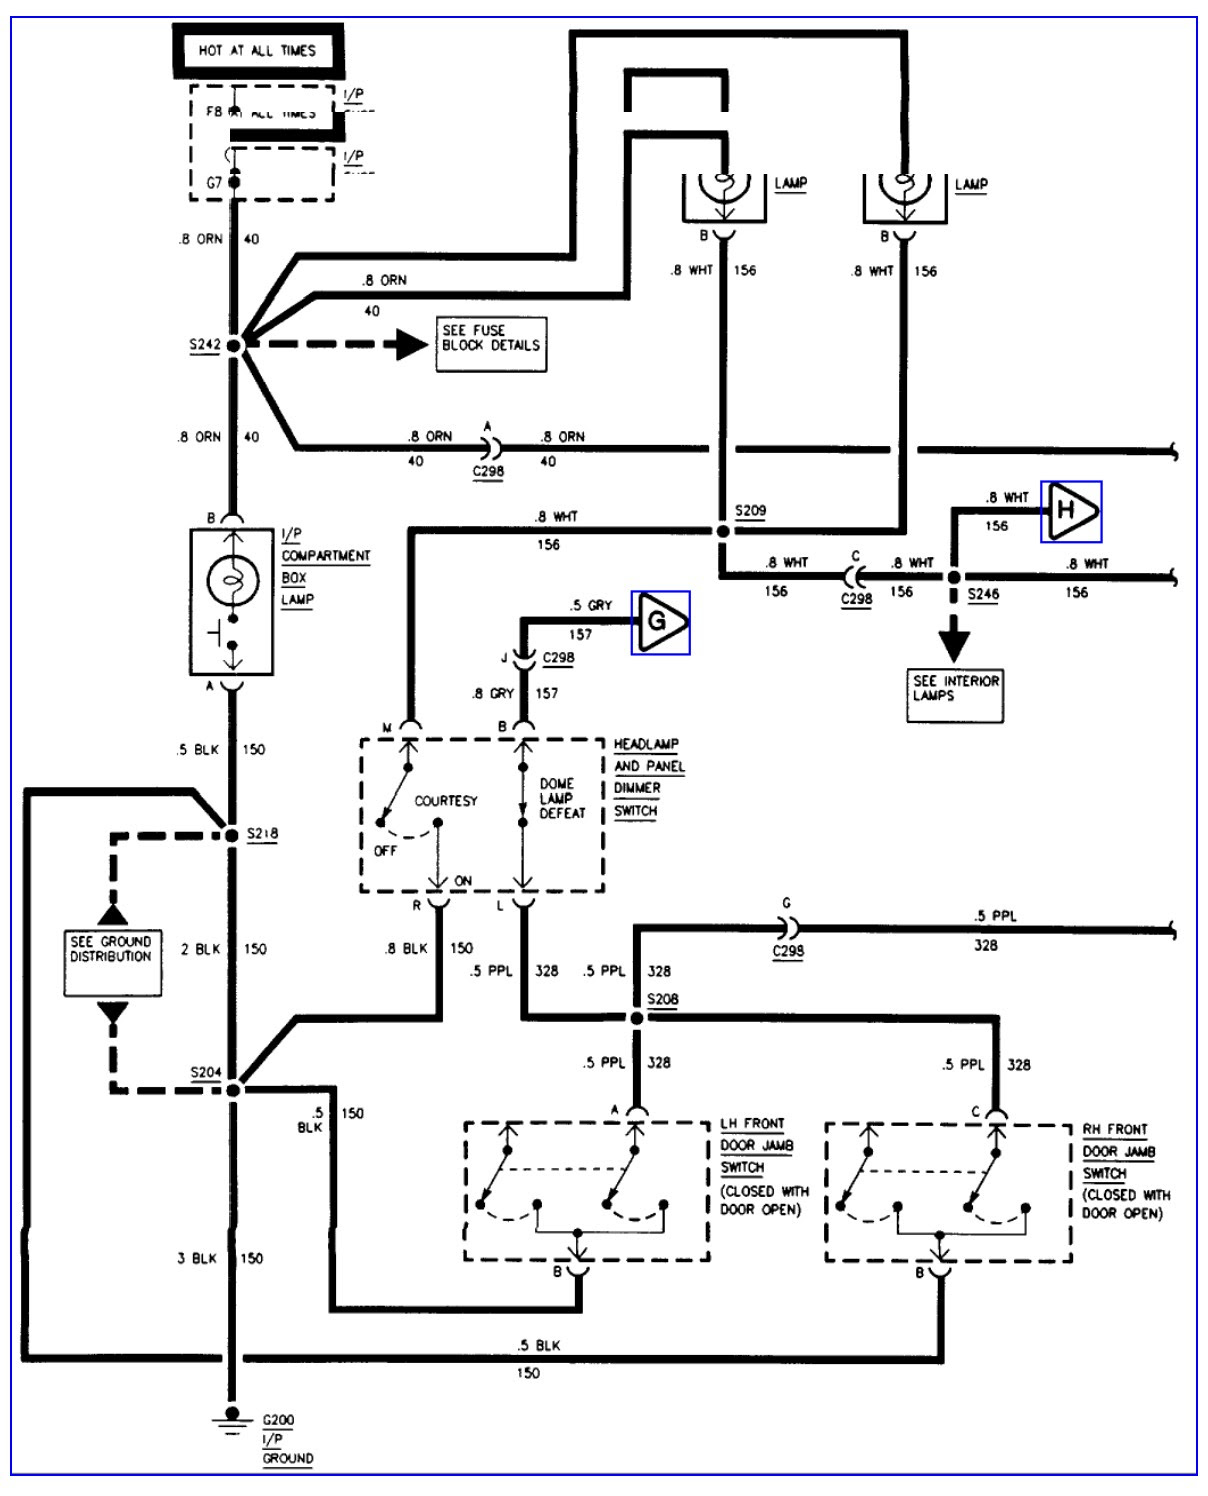 1996 Topkick Wiring Diagram